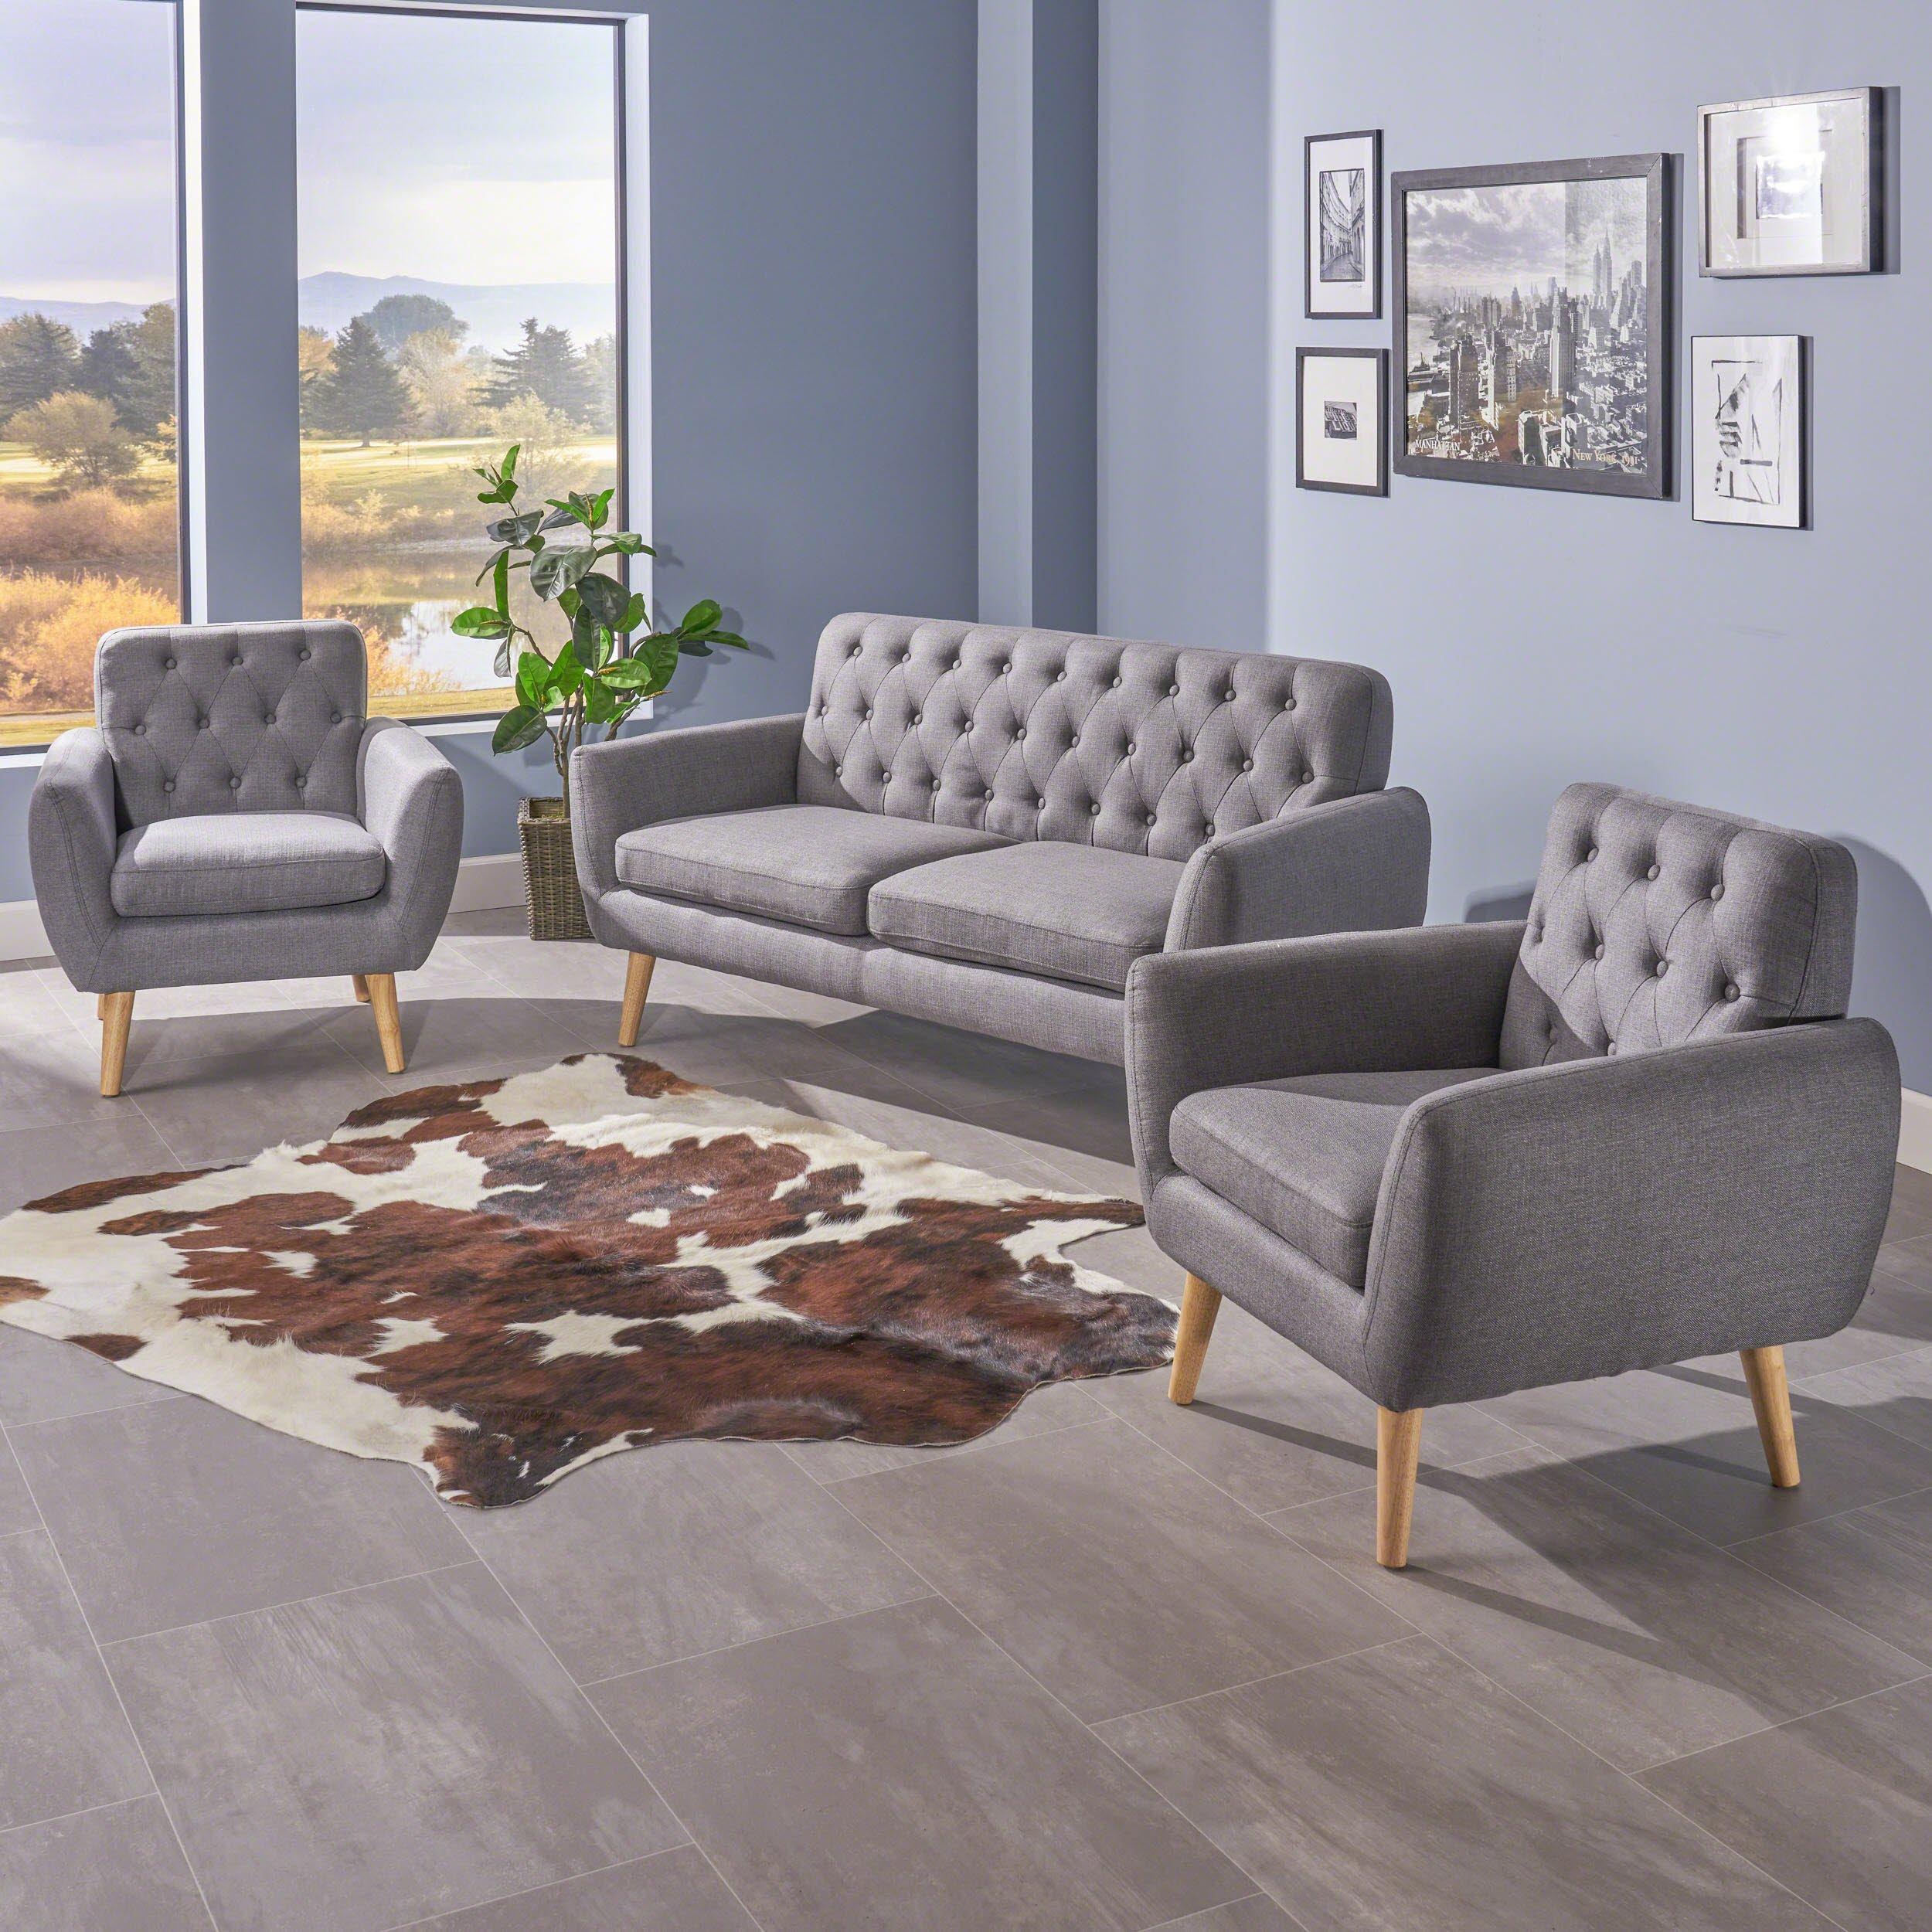 Christopher Knight Home Eunice Petite Mid Century Modern Tufted Dark Grey Fabric 3 Piece Sofa and Club Chairs Set by Christopher Knight Home